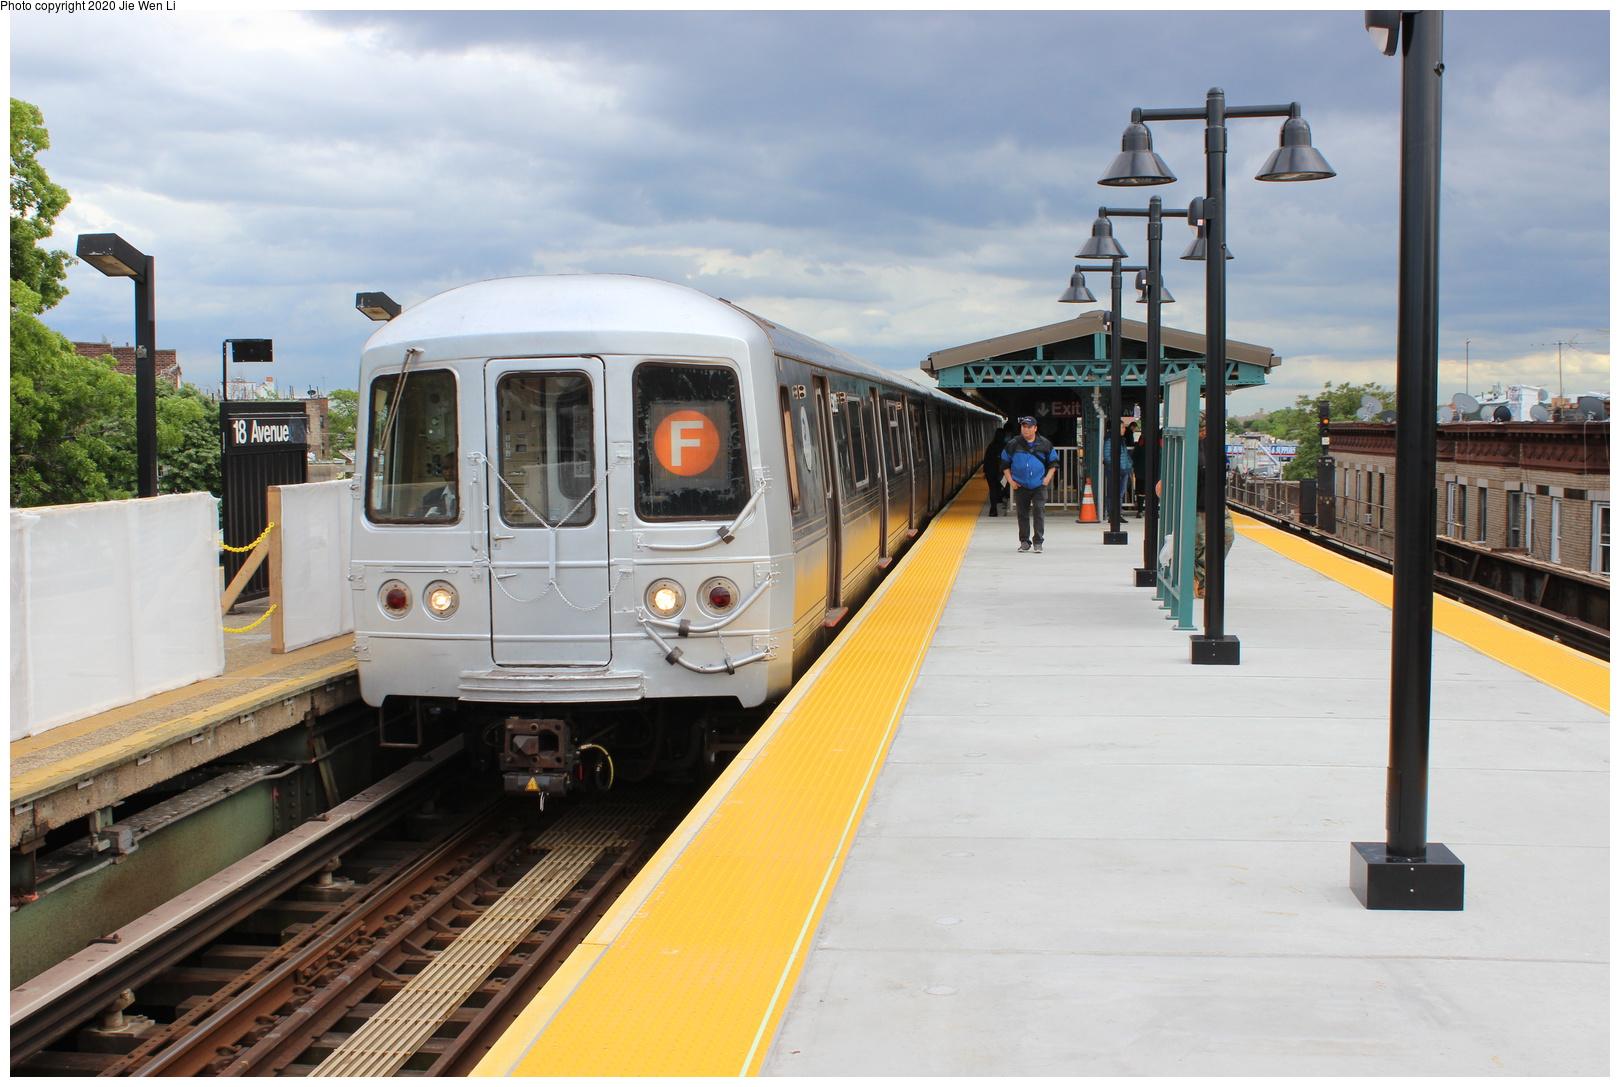 (188k, 1044x726)<br><b>Country:</b> United States<br><b>City:</b> New York<br><b>System:</b> New York City Transit<br><b>Line:</b> BMT Fulton<br><b>Car:</b> BMT C  <br><b>Photo by:</b> Joel Shanus<br><b>Viewed (this week/total):</b> 5 / 3666